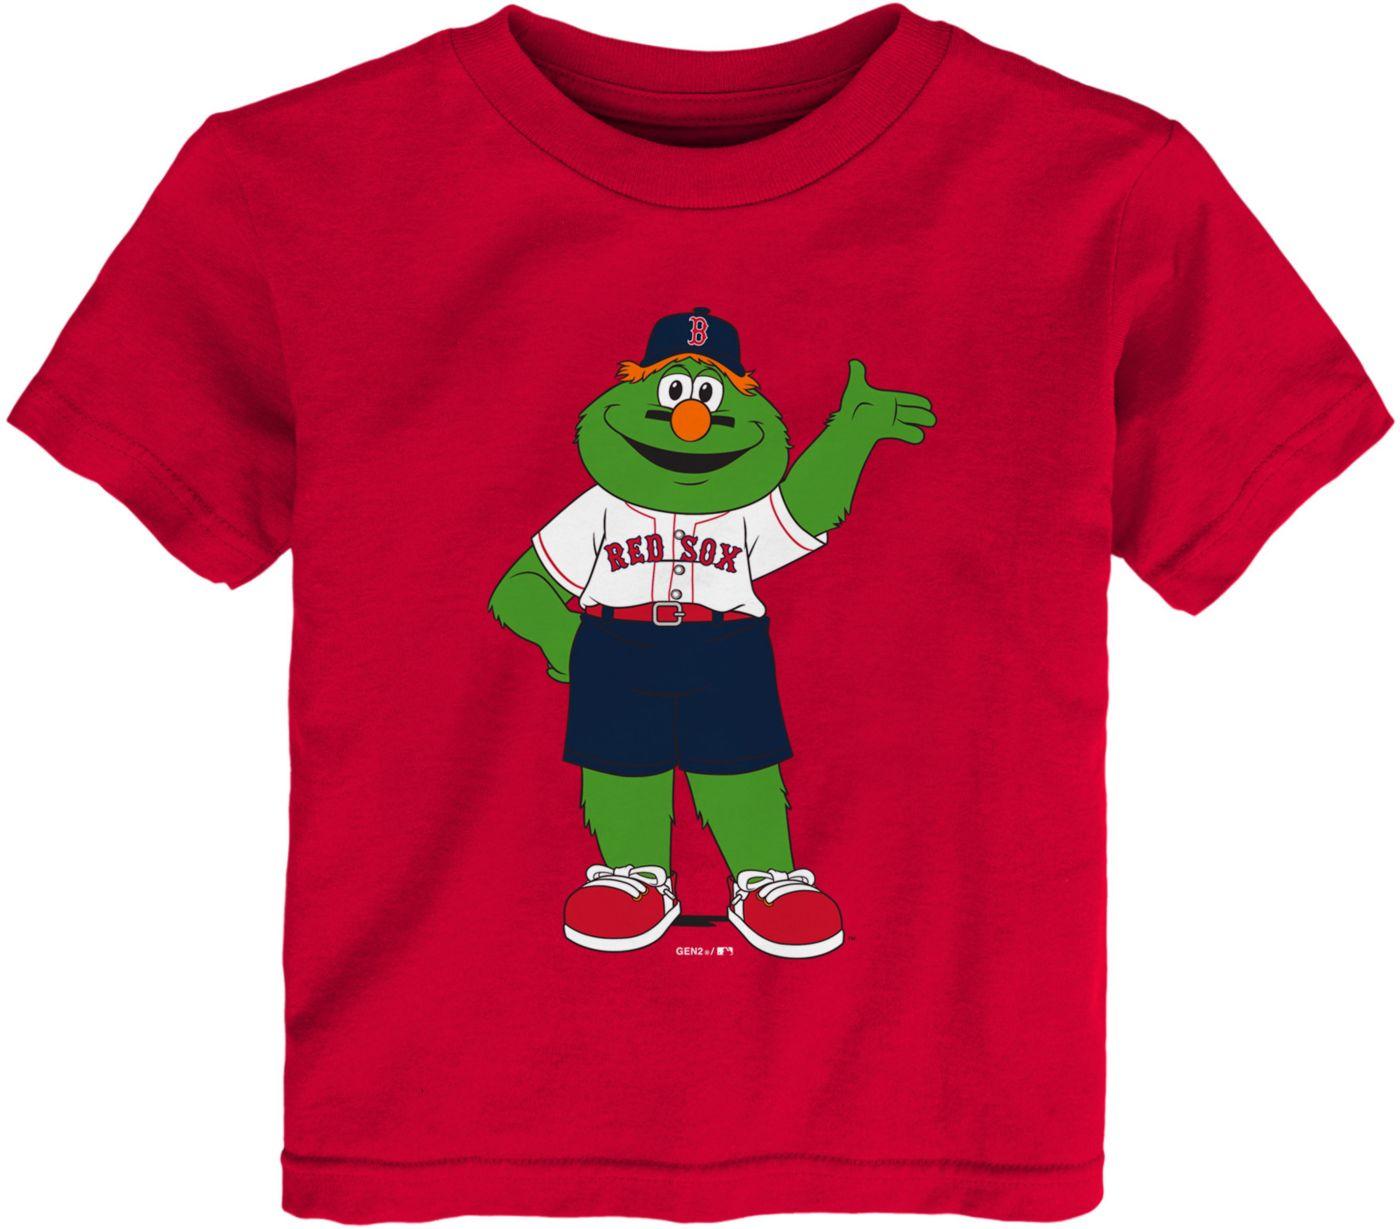 Gen2 Toddler Boston Red Sox Mascot T-Shirt